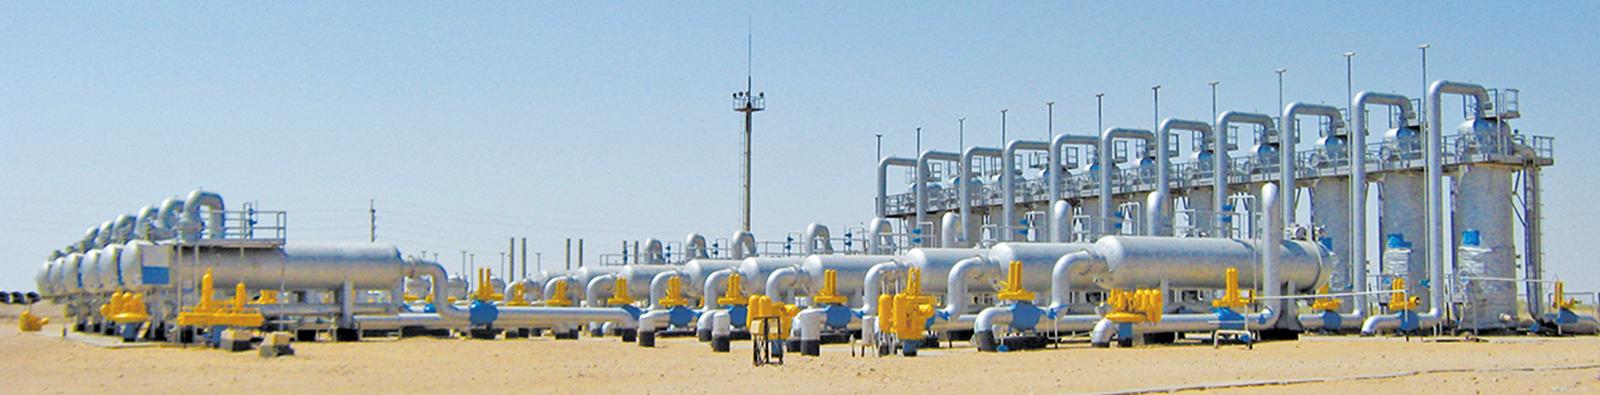 https://www.oilgas.gov.tm/storage/posts/880/original-15f8575489857d.png